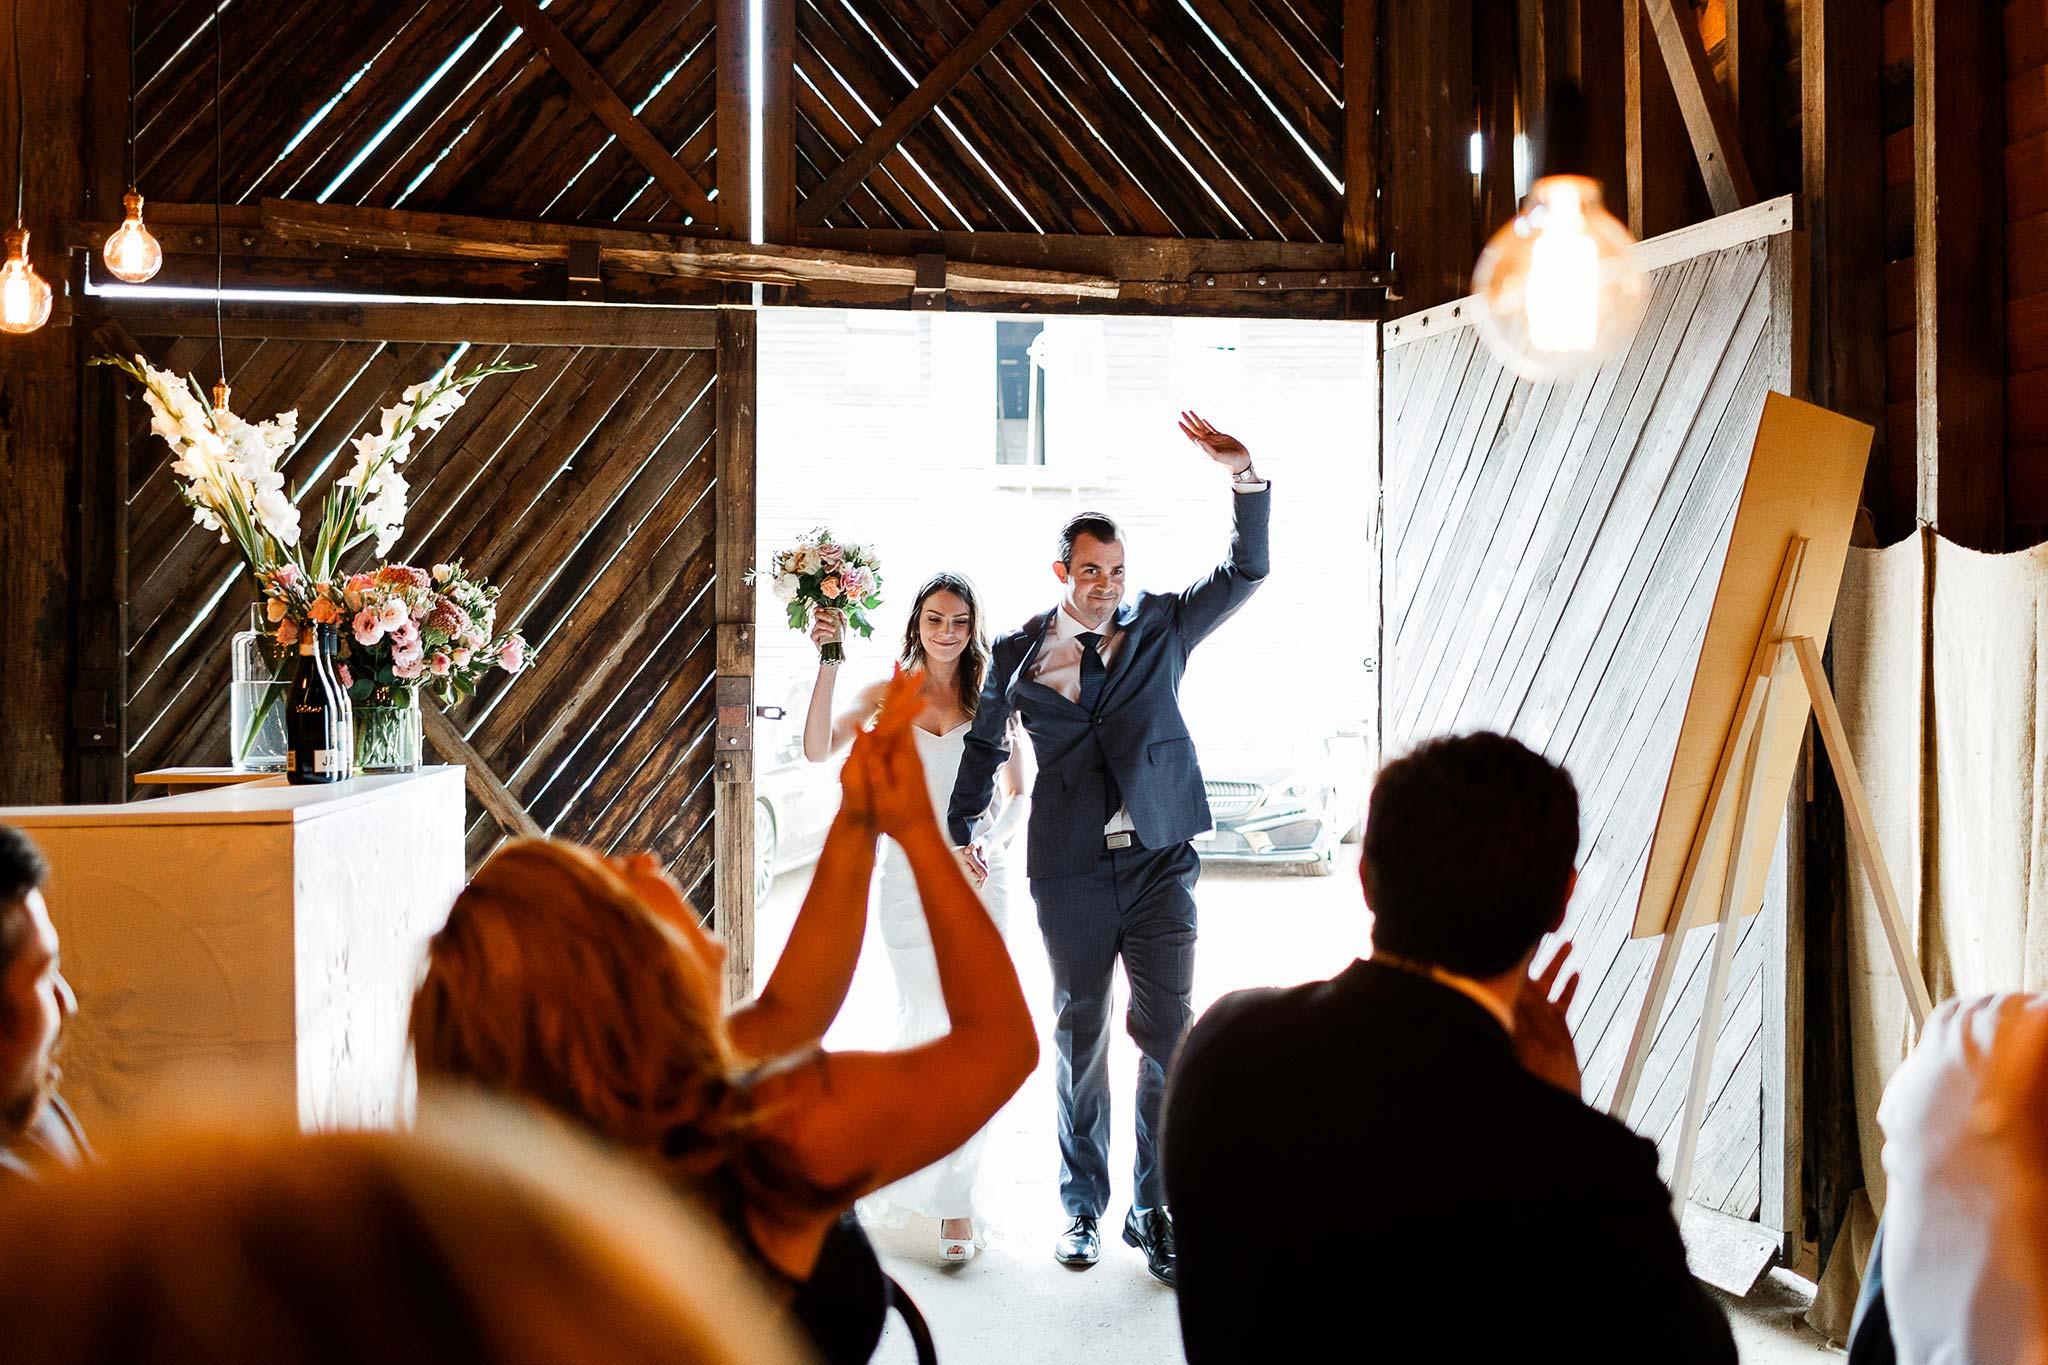 Launceston-Brickendon-barn-Wedding-Photographer-reception-entrance